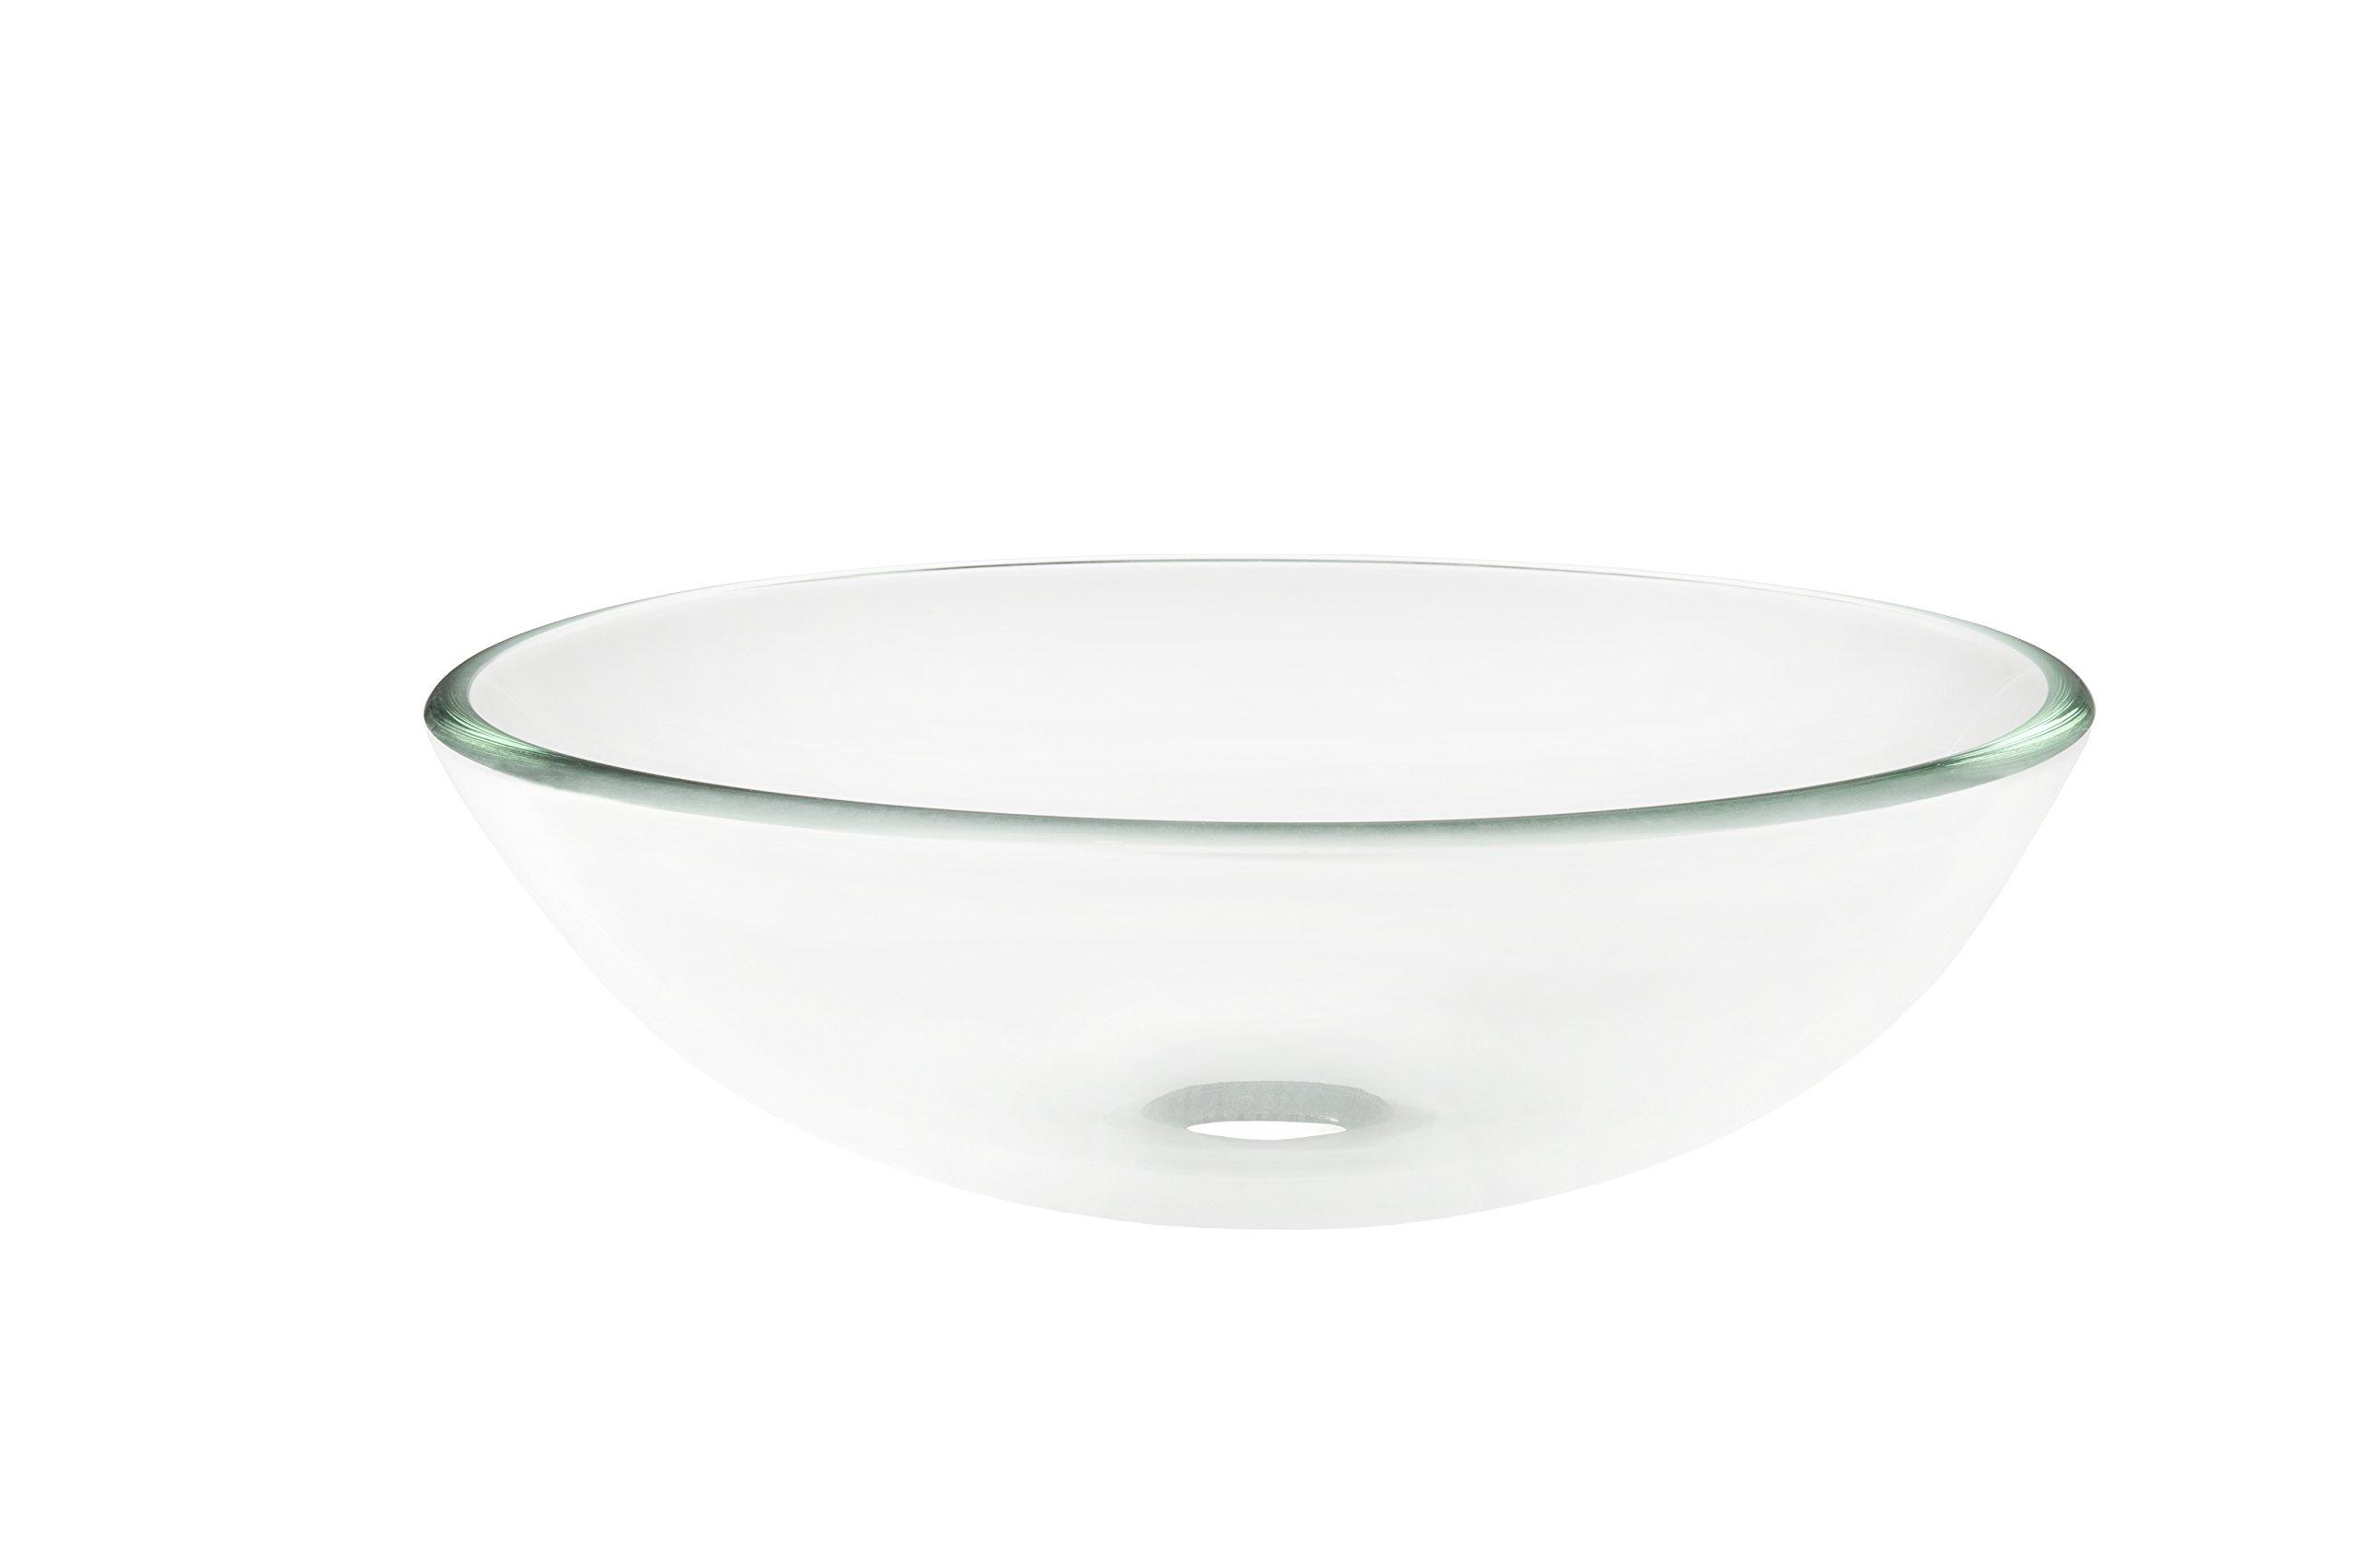 Novatto BONIFICARE Glass Vessel Bathroom Sink